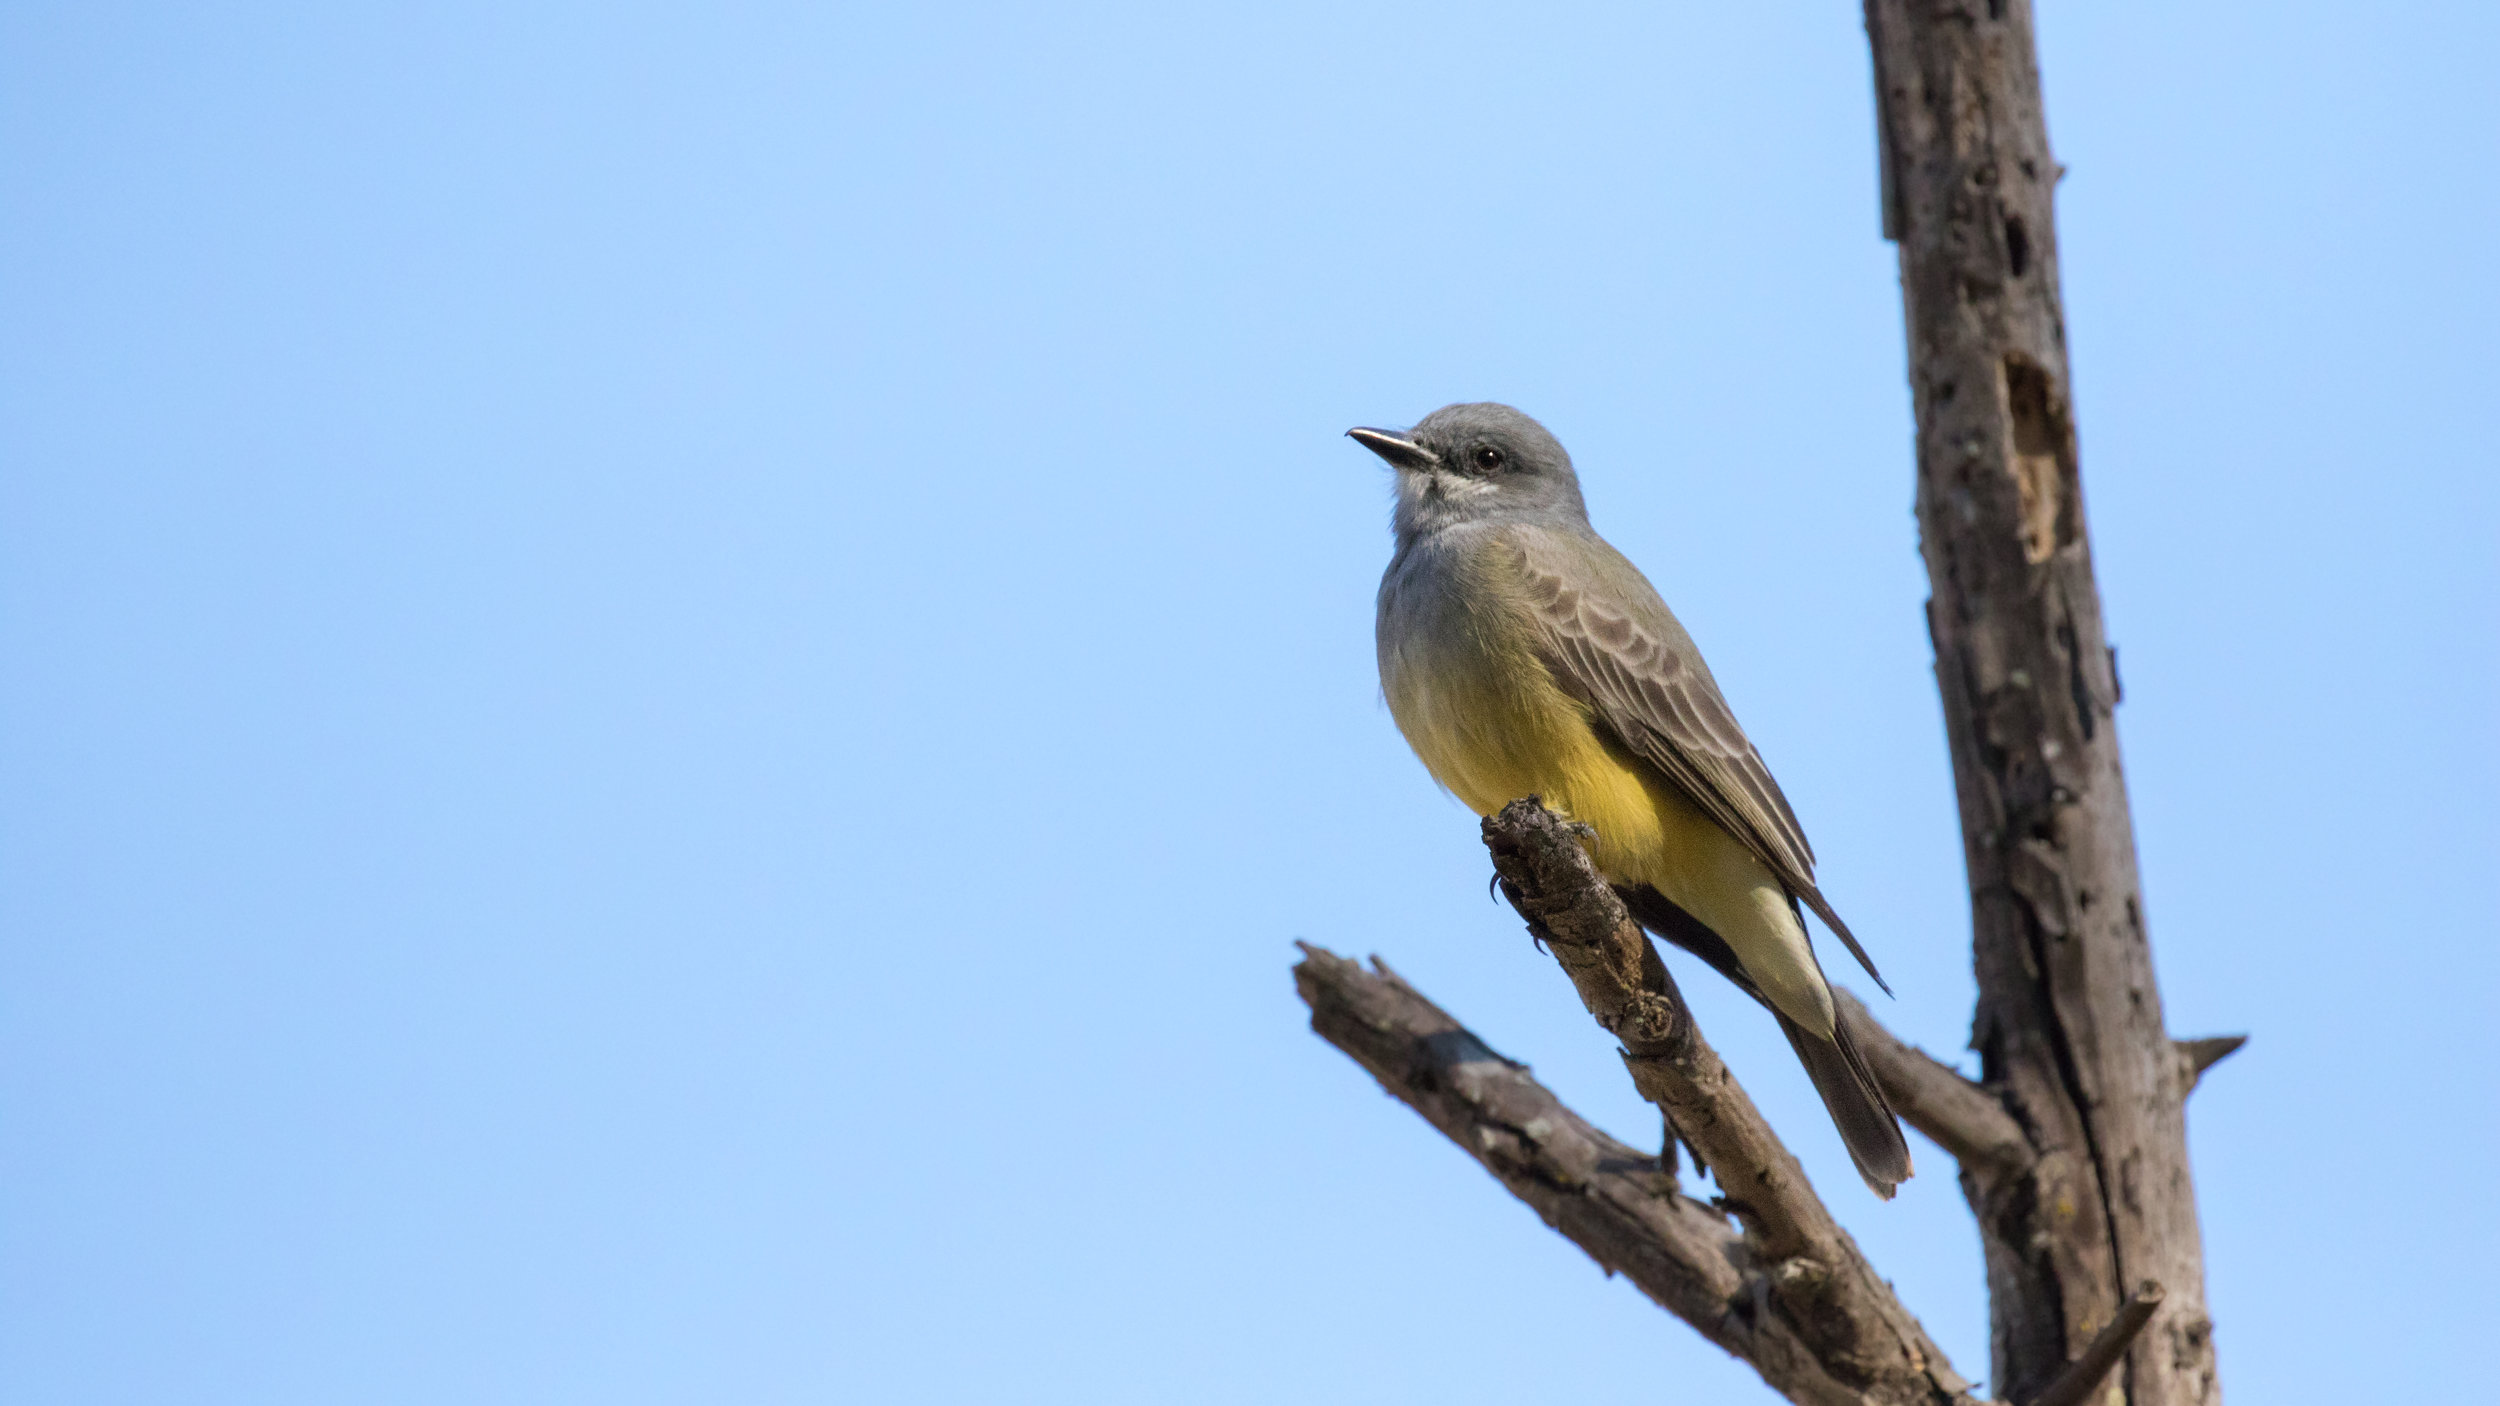 Cassin's Kingbird (Tyrannus vociferans) in Laguna Niguel, Orange County, California. December 2015. Not baited. Not called in.